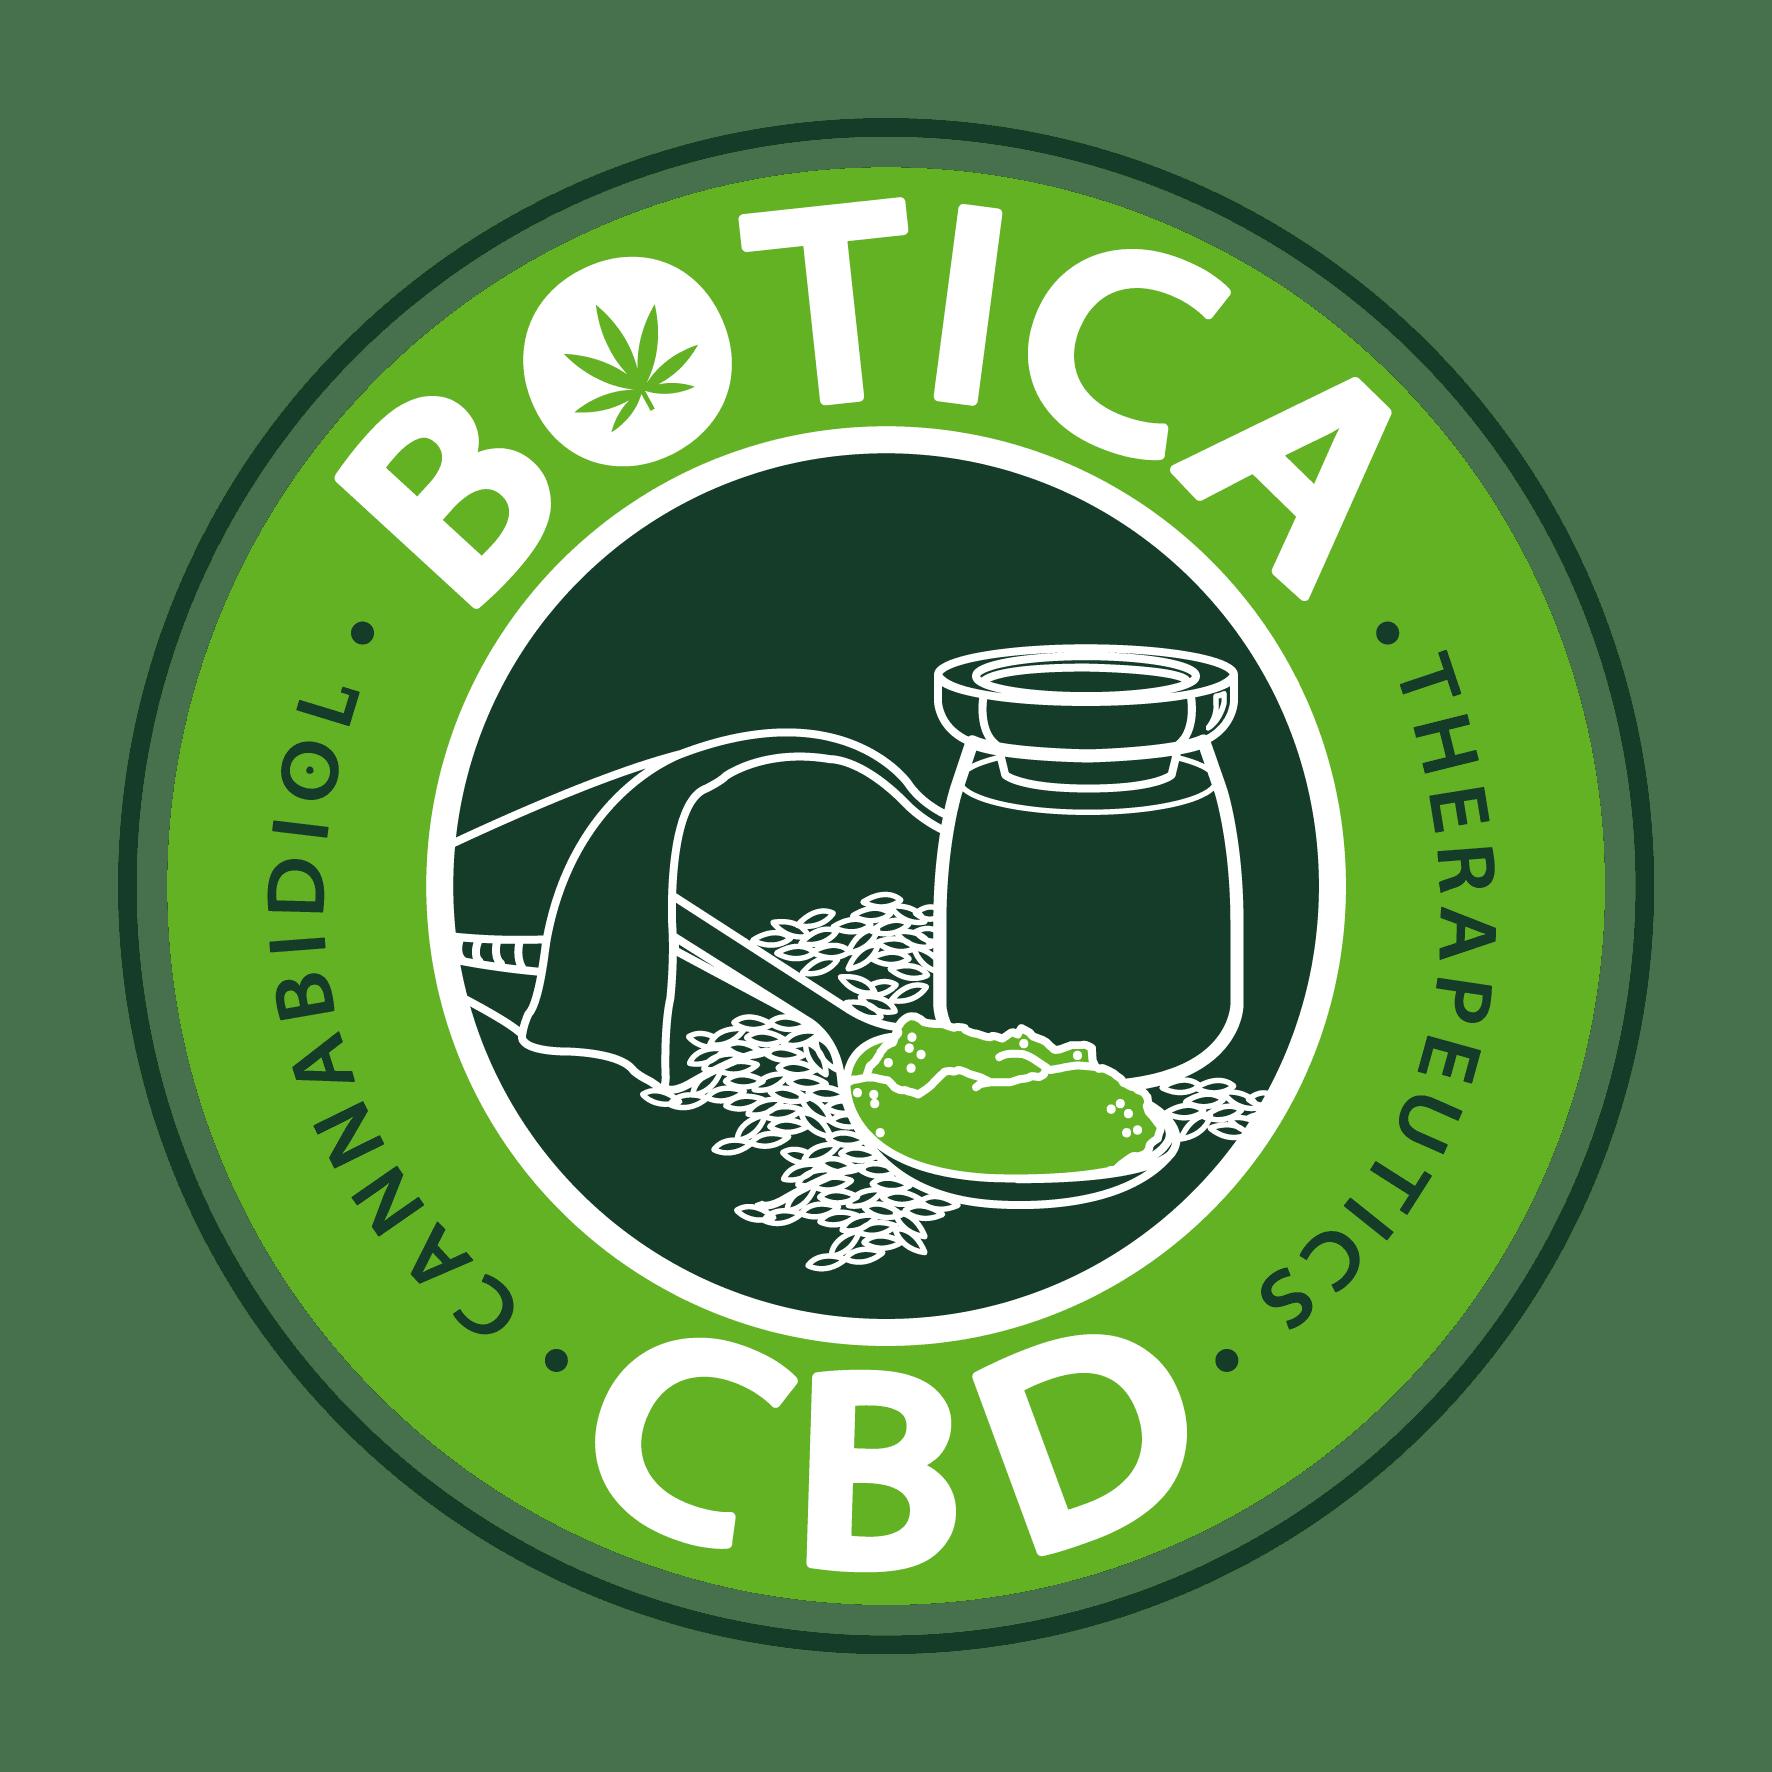 Botica CBD Inc